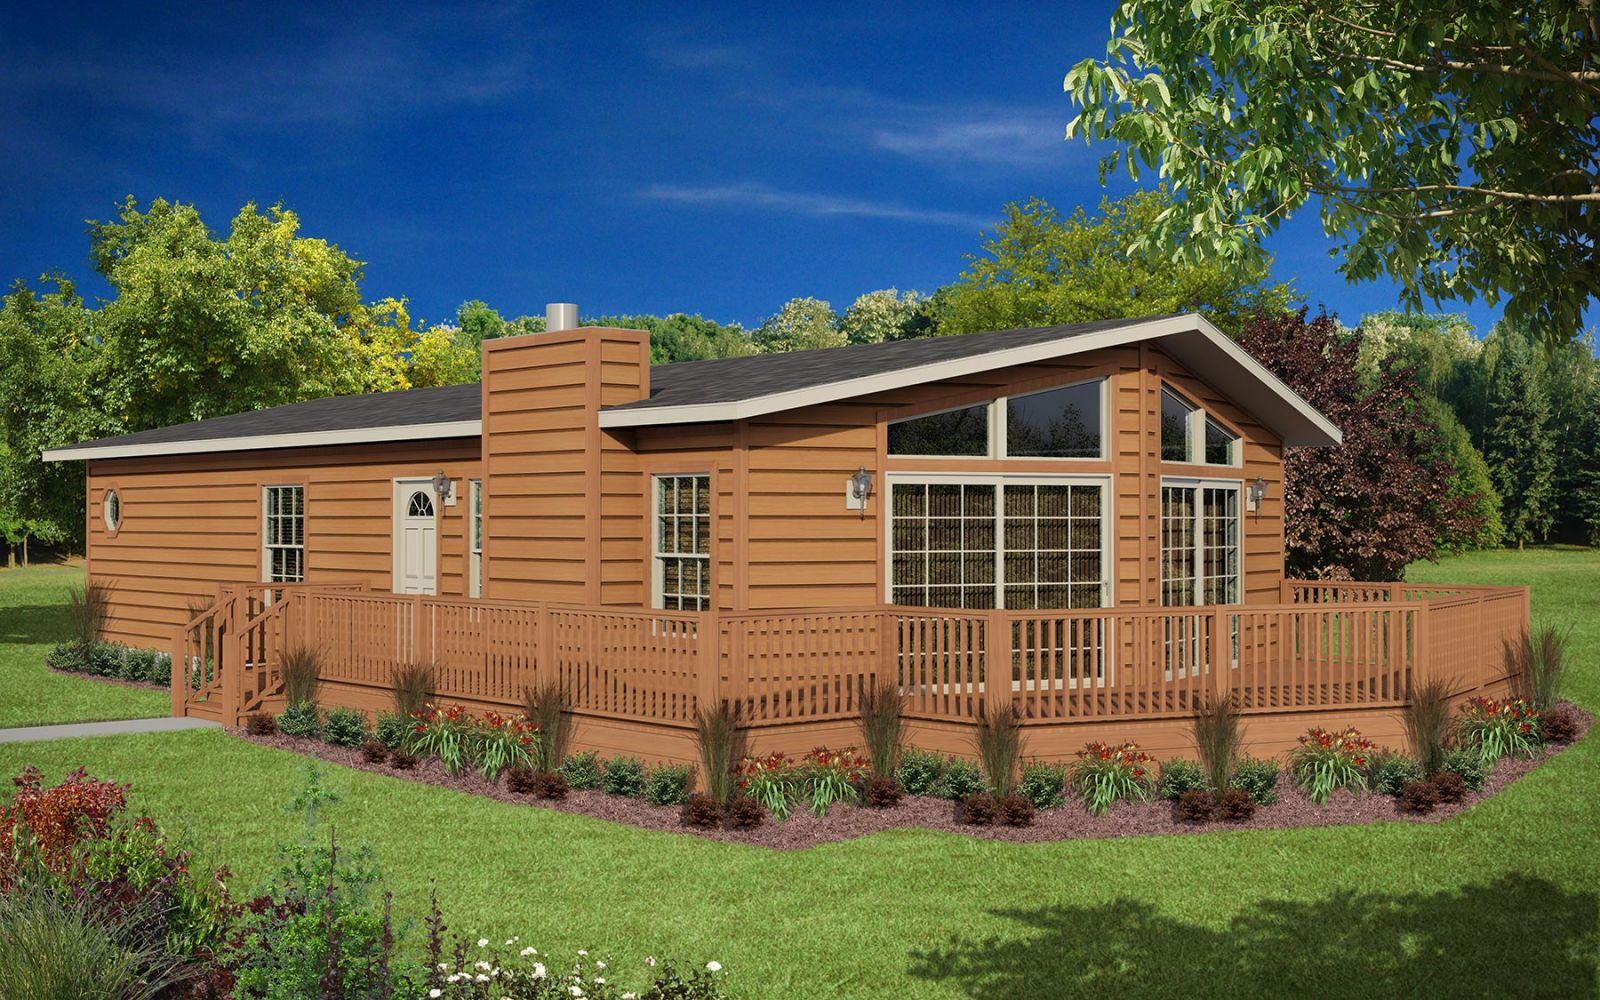 Wood Manor D502 - Skyline Homes